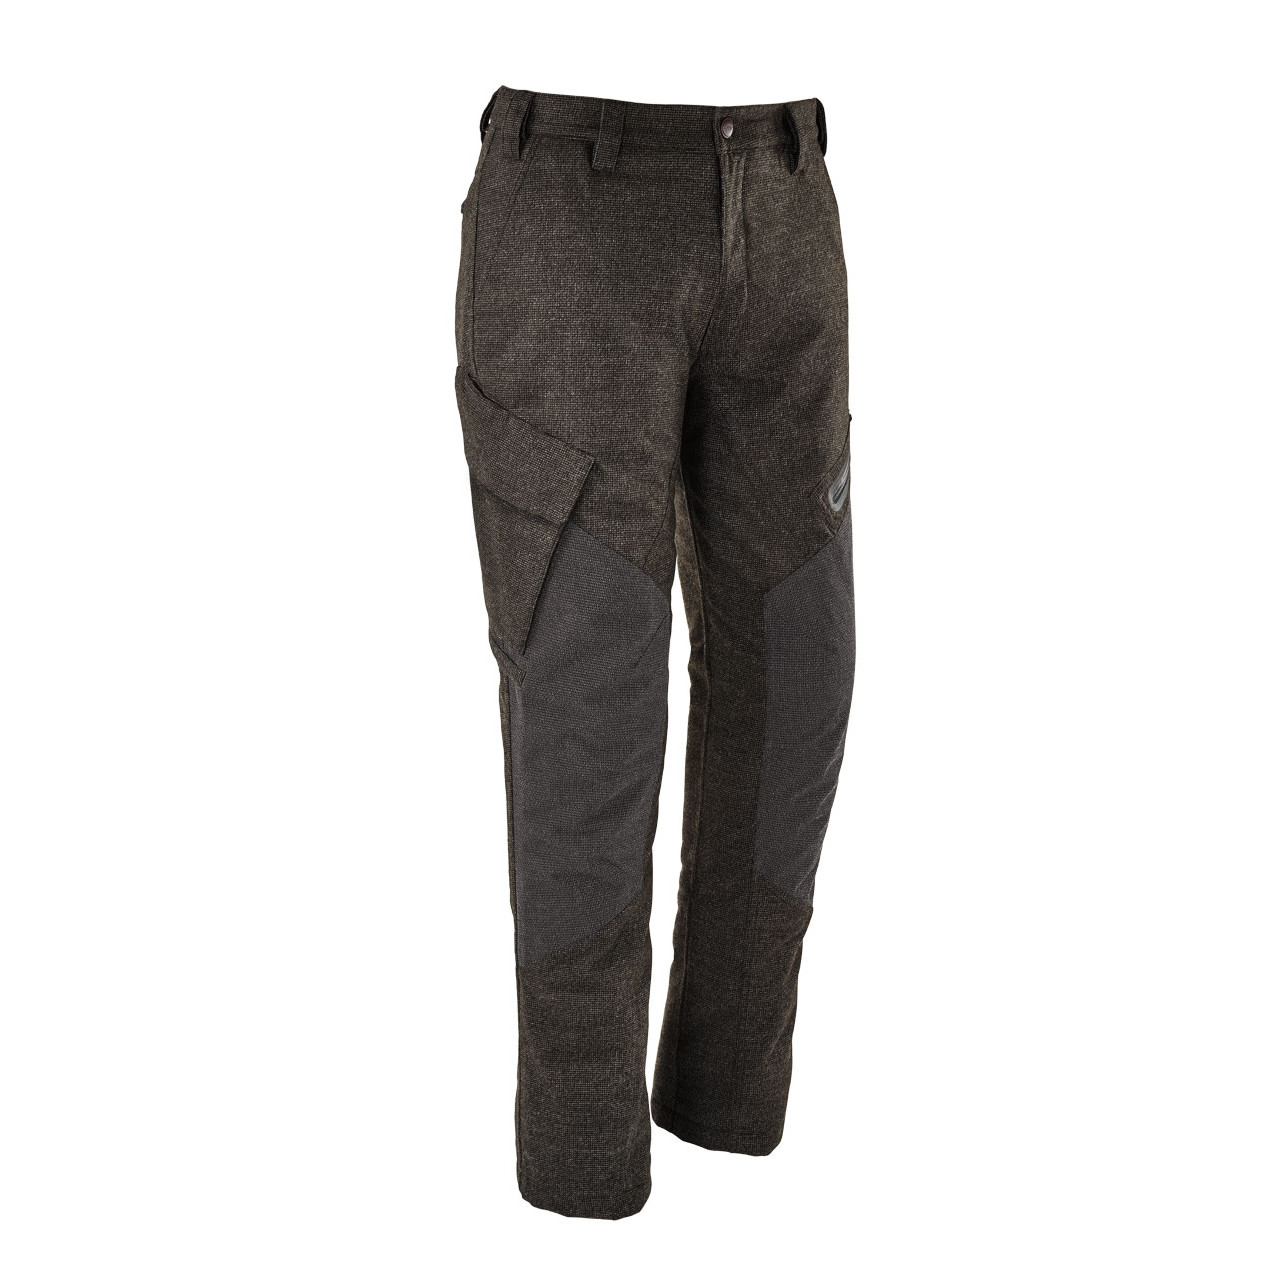 pantaloni vanatoare Blaser Graphite grey-brown mottled